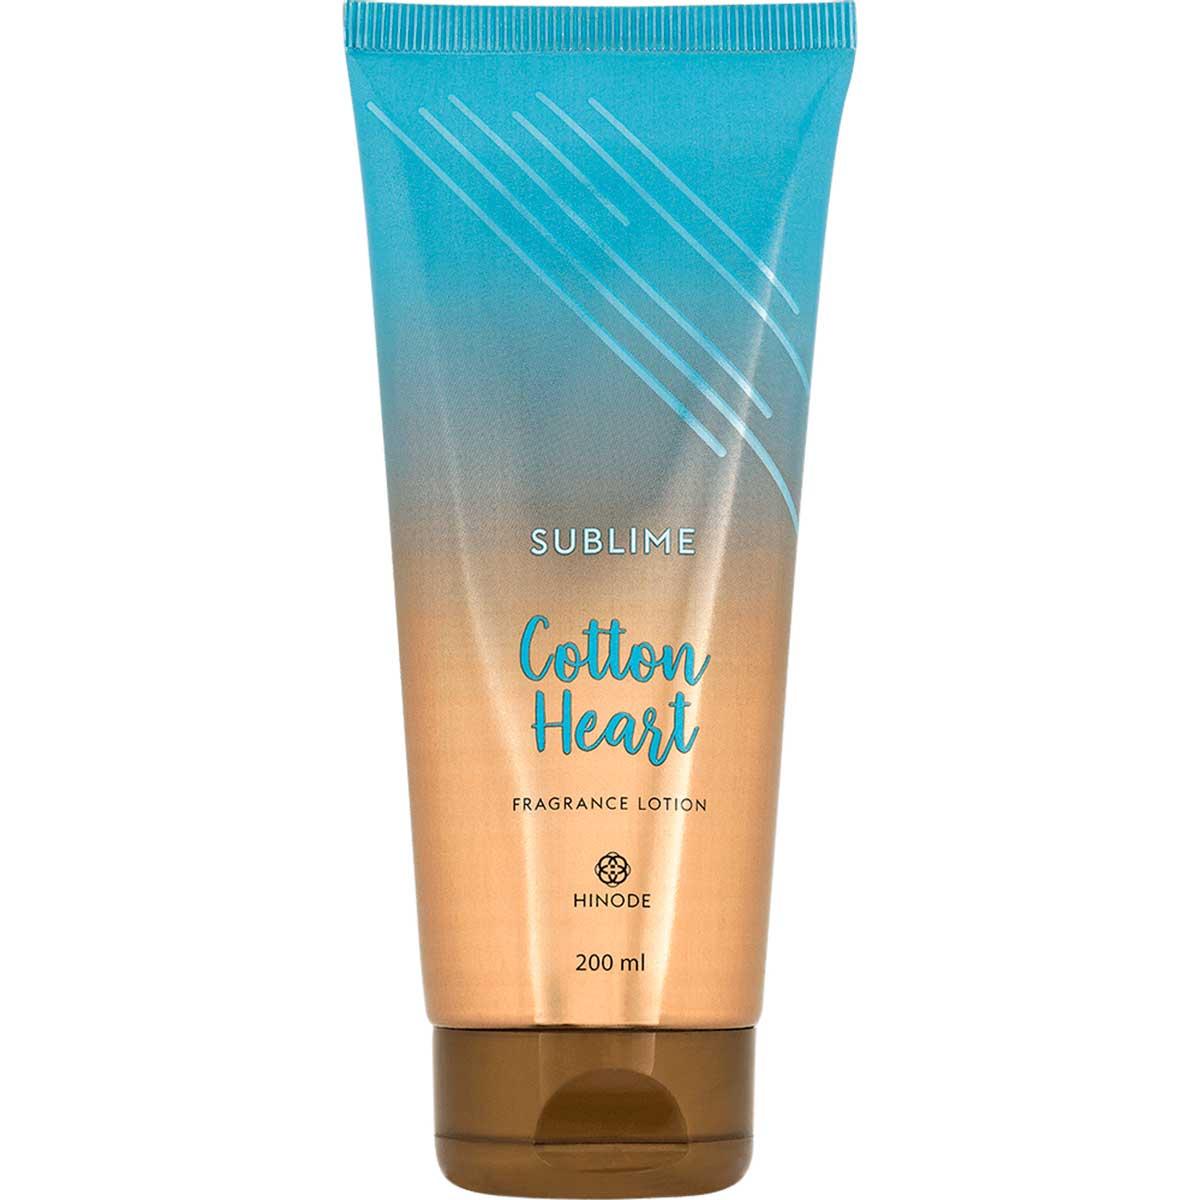 Hidratante Sublime Cotton Heart 200ml - Hinode